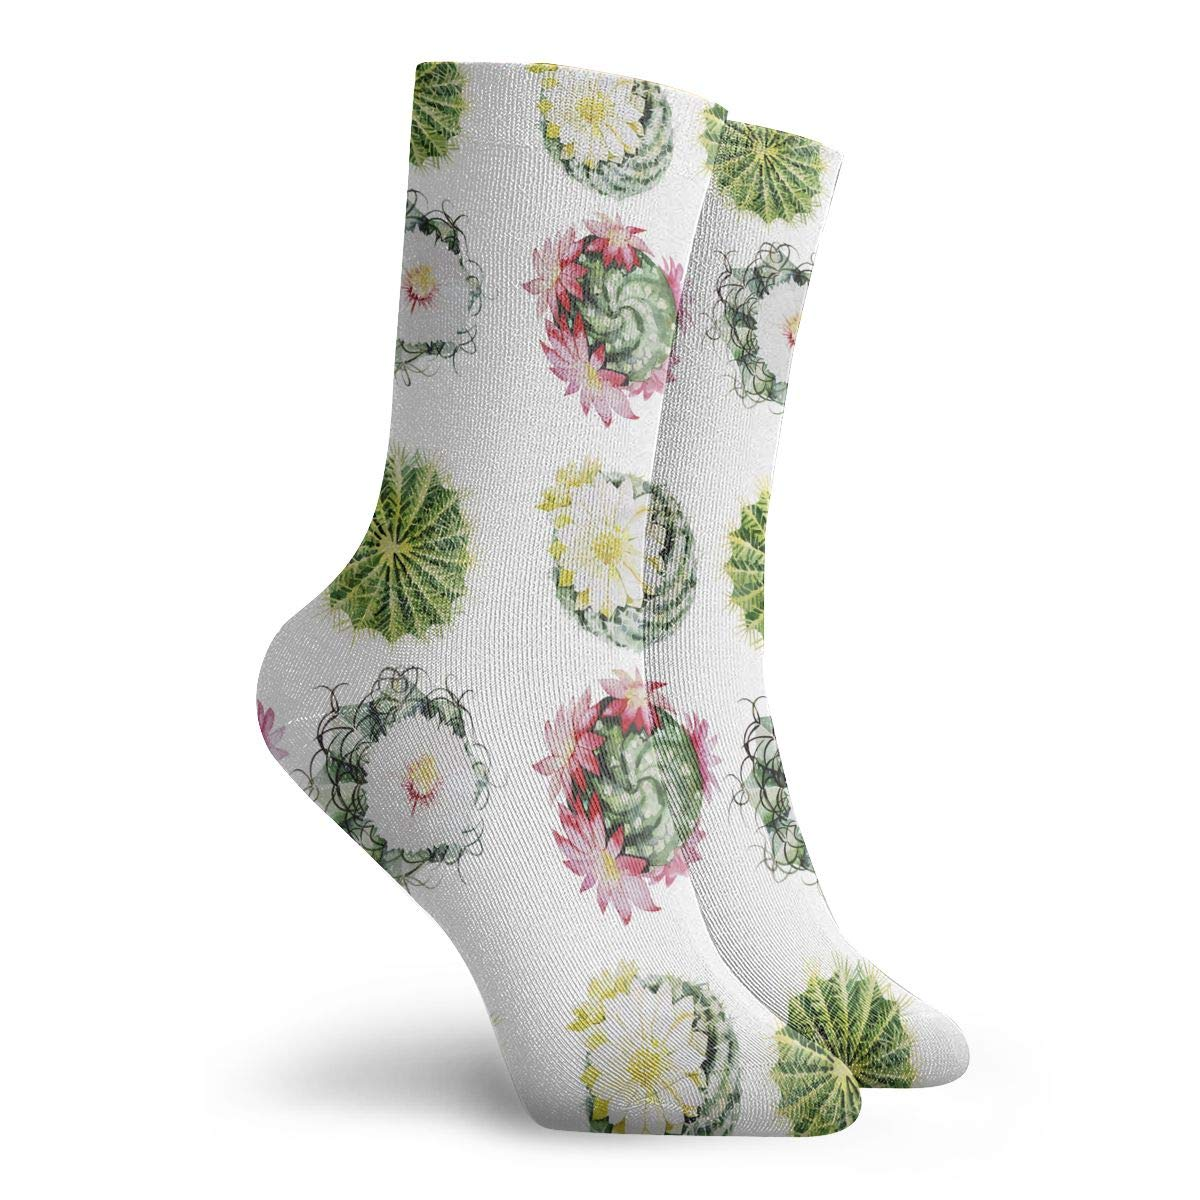 Unisex Watercolor Cactus Set Athletic Quarter Ankle Print Breathable Hiking Running Socks